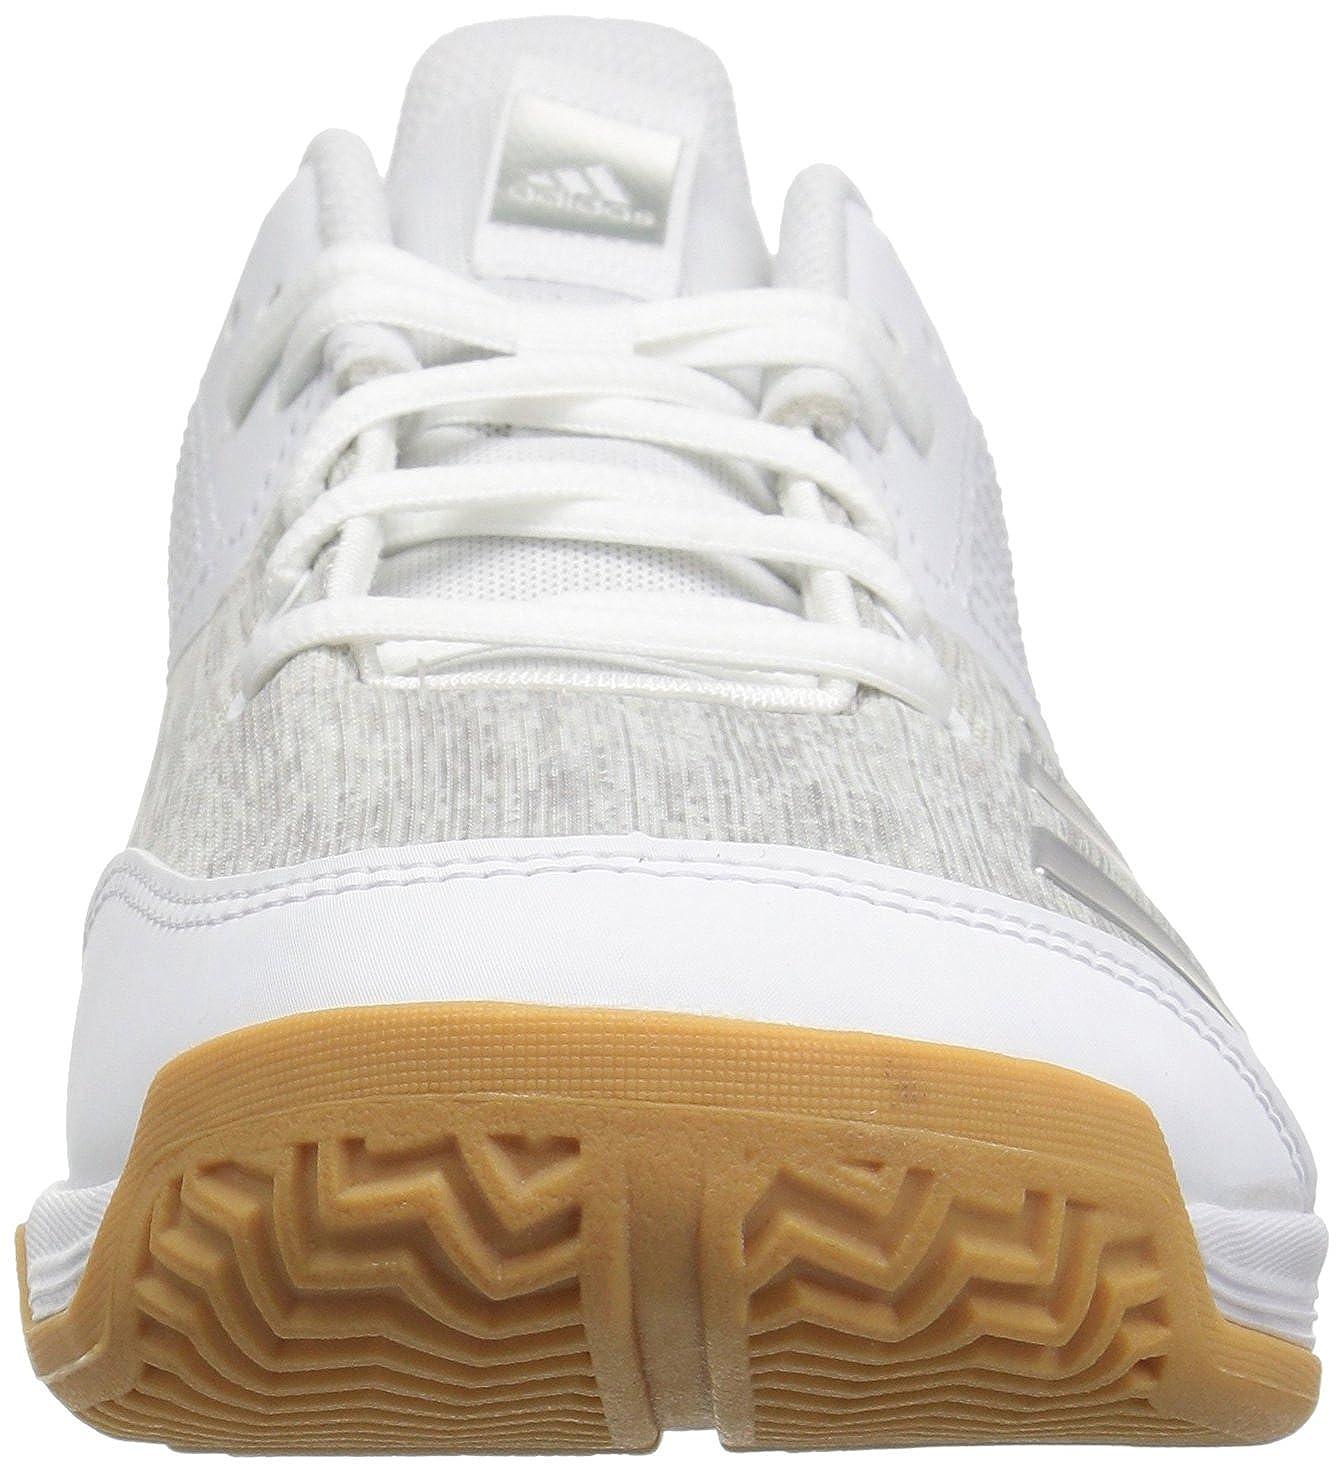 wholesale dealer e2a0c ac301 Amazon.com  adidas Originals Womens Ligra 6 Volleyball Shoe  Volleyball